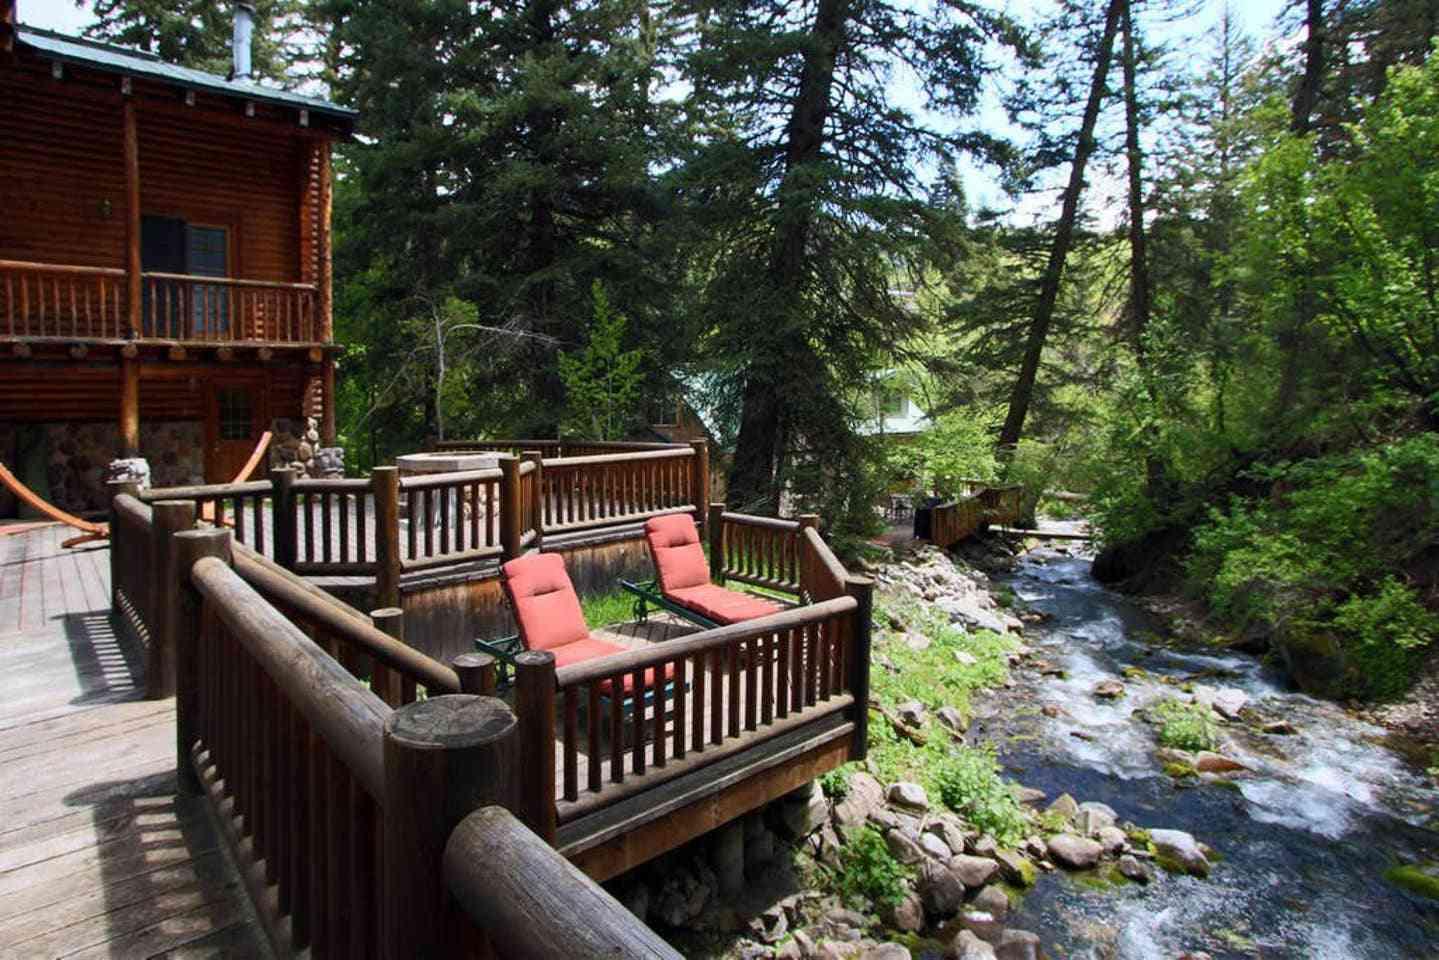 Log Cabin on the Stream